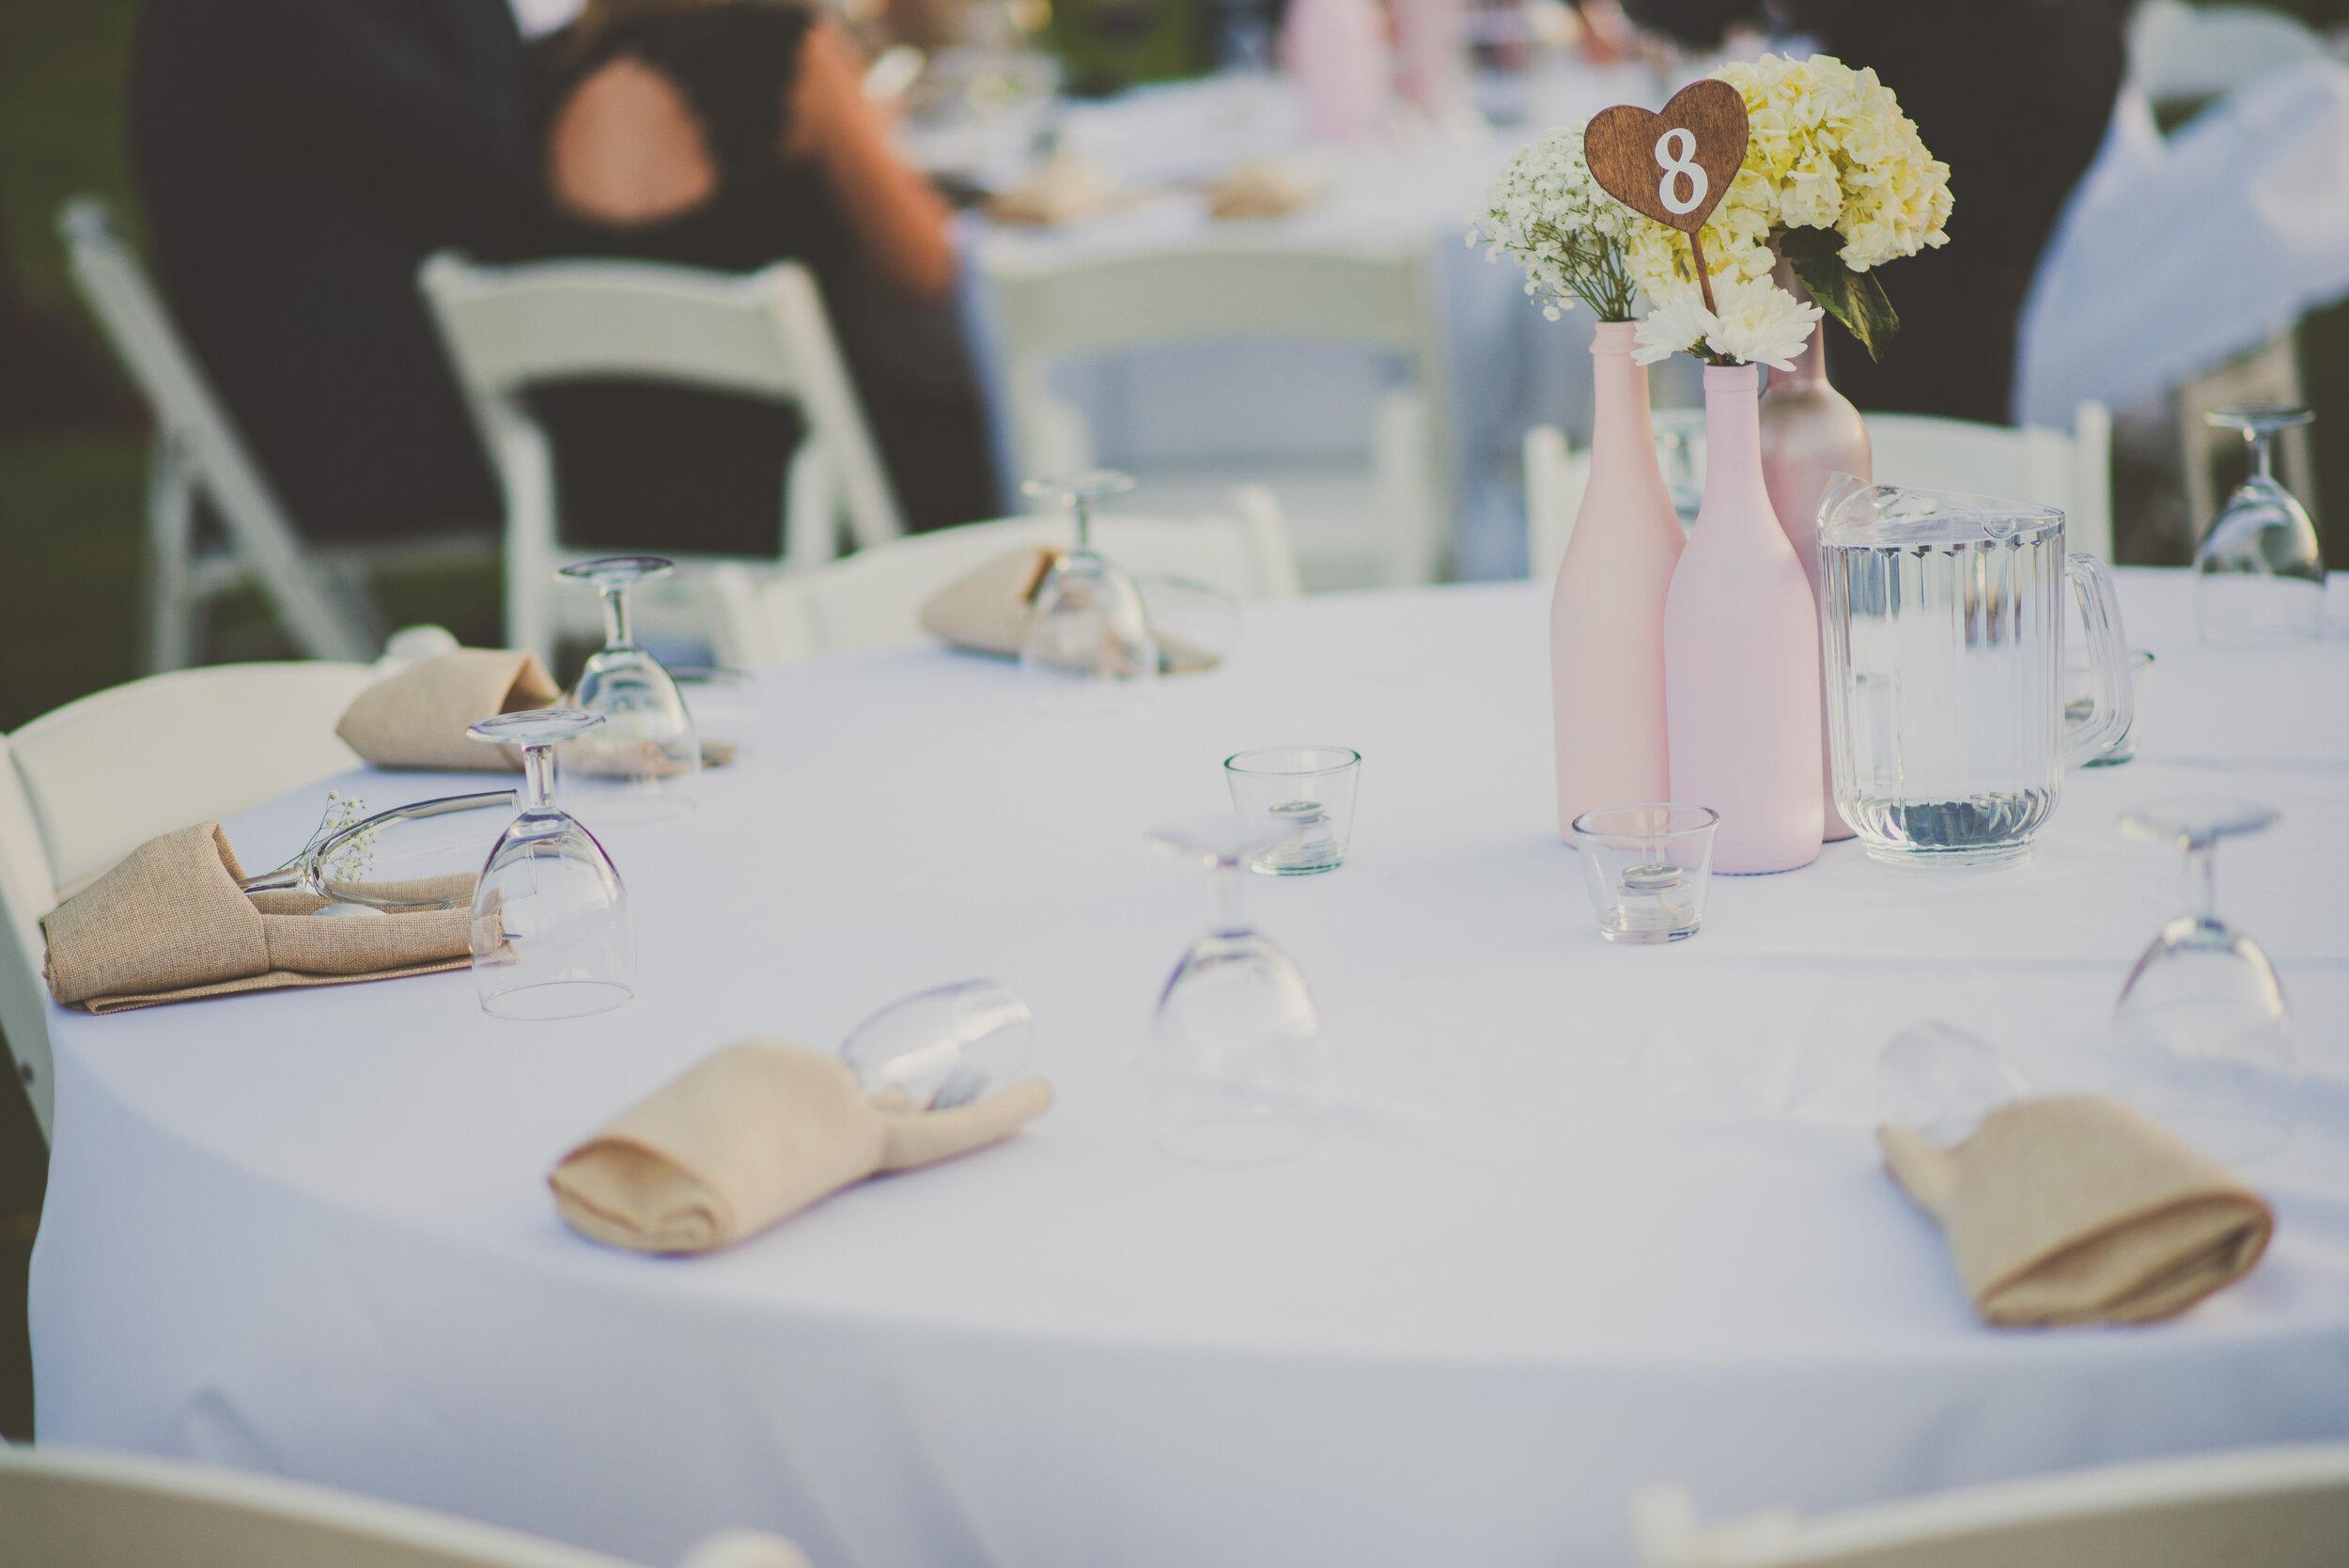 Roberts Wedding - Reception-11.jpg